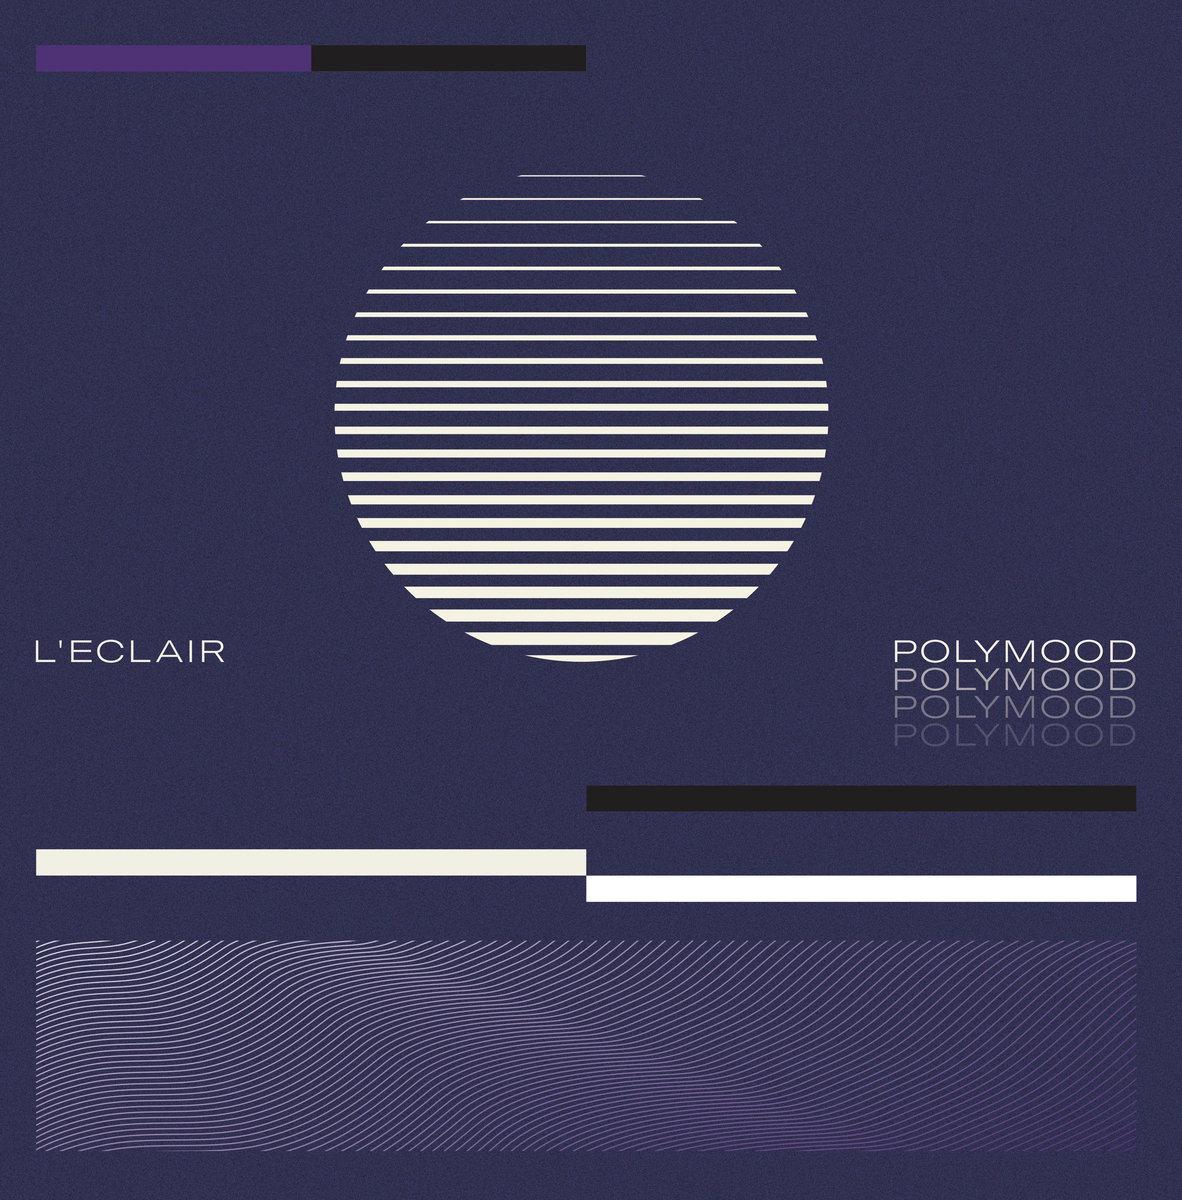 L'Eclair - Polymood